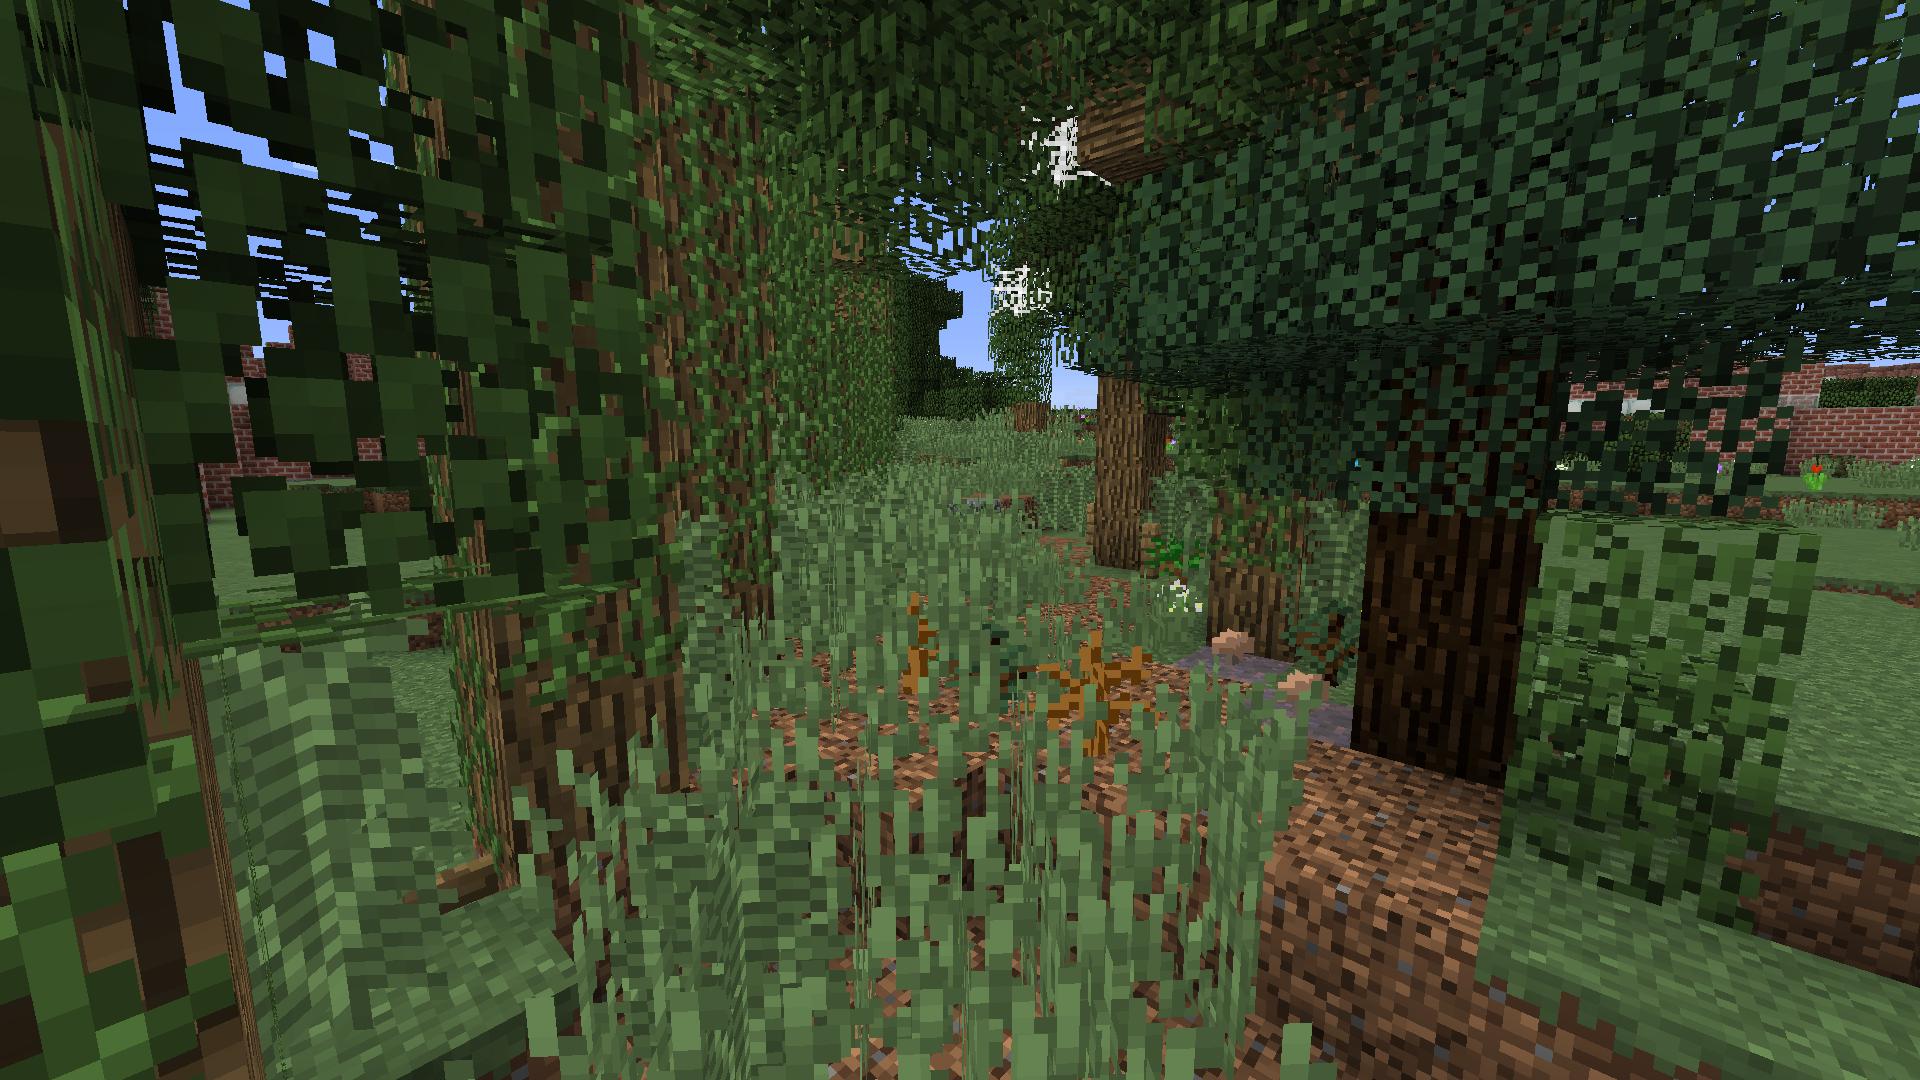 Warwick Road wilderness mock-up in Minecraft